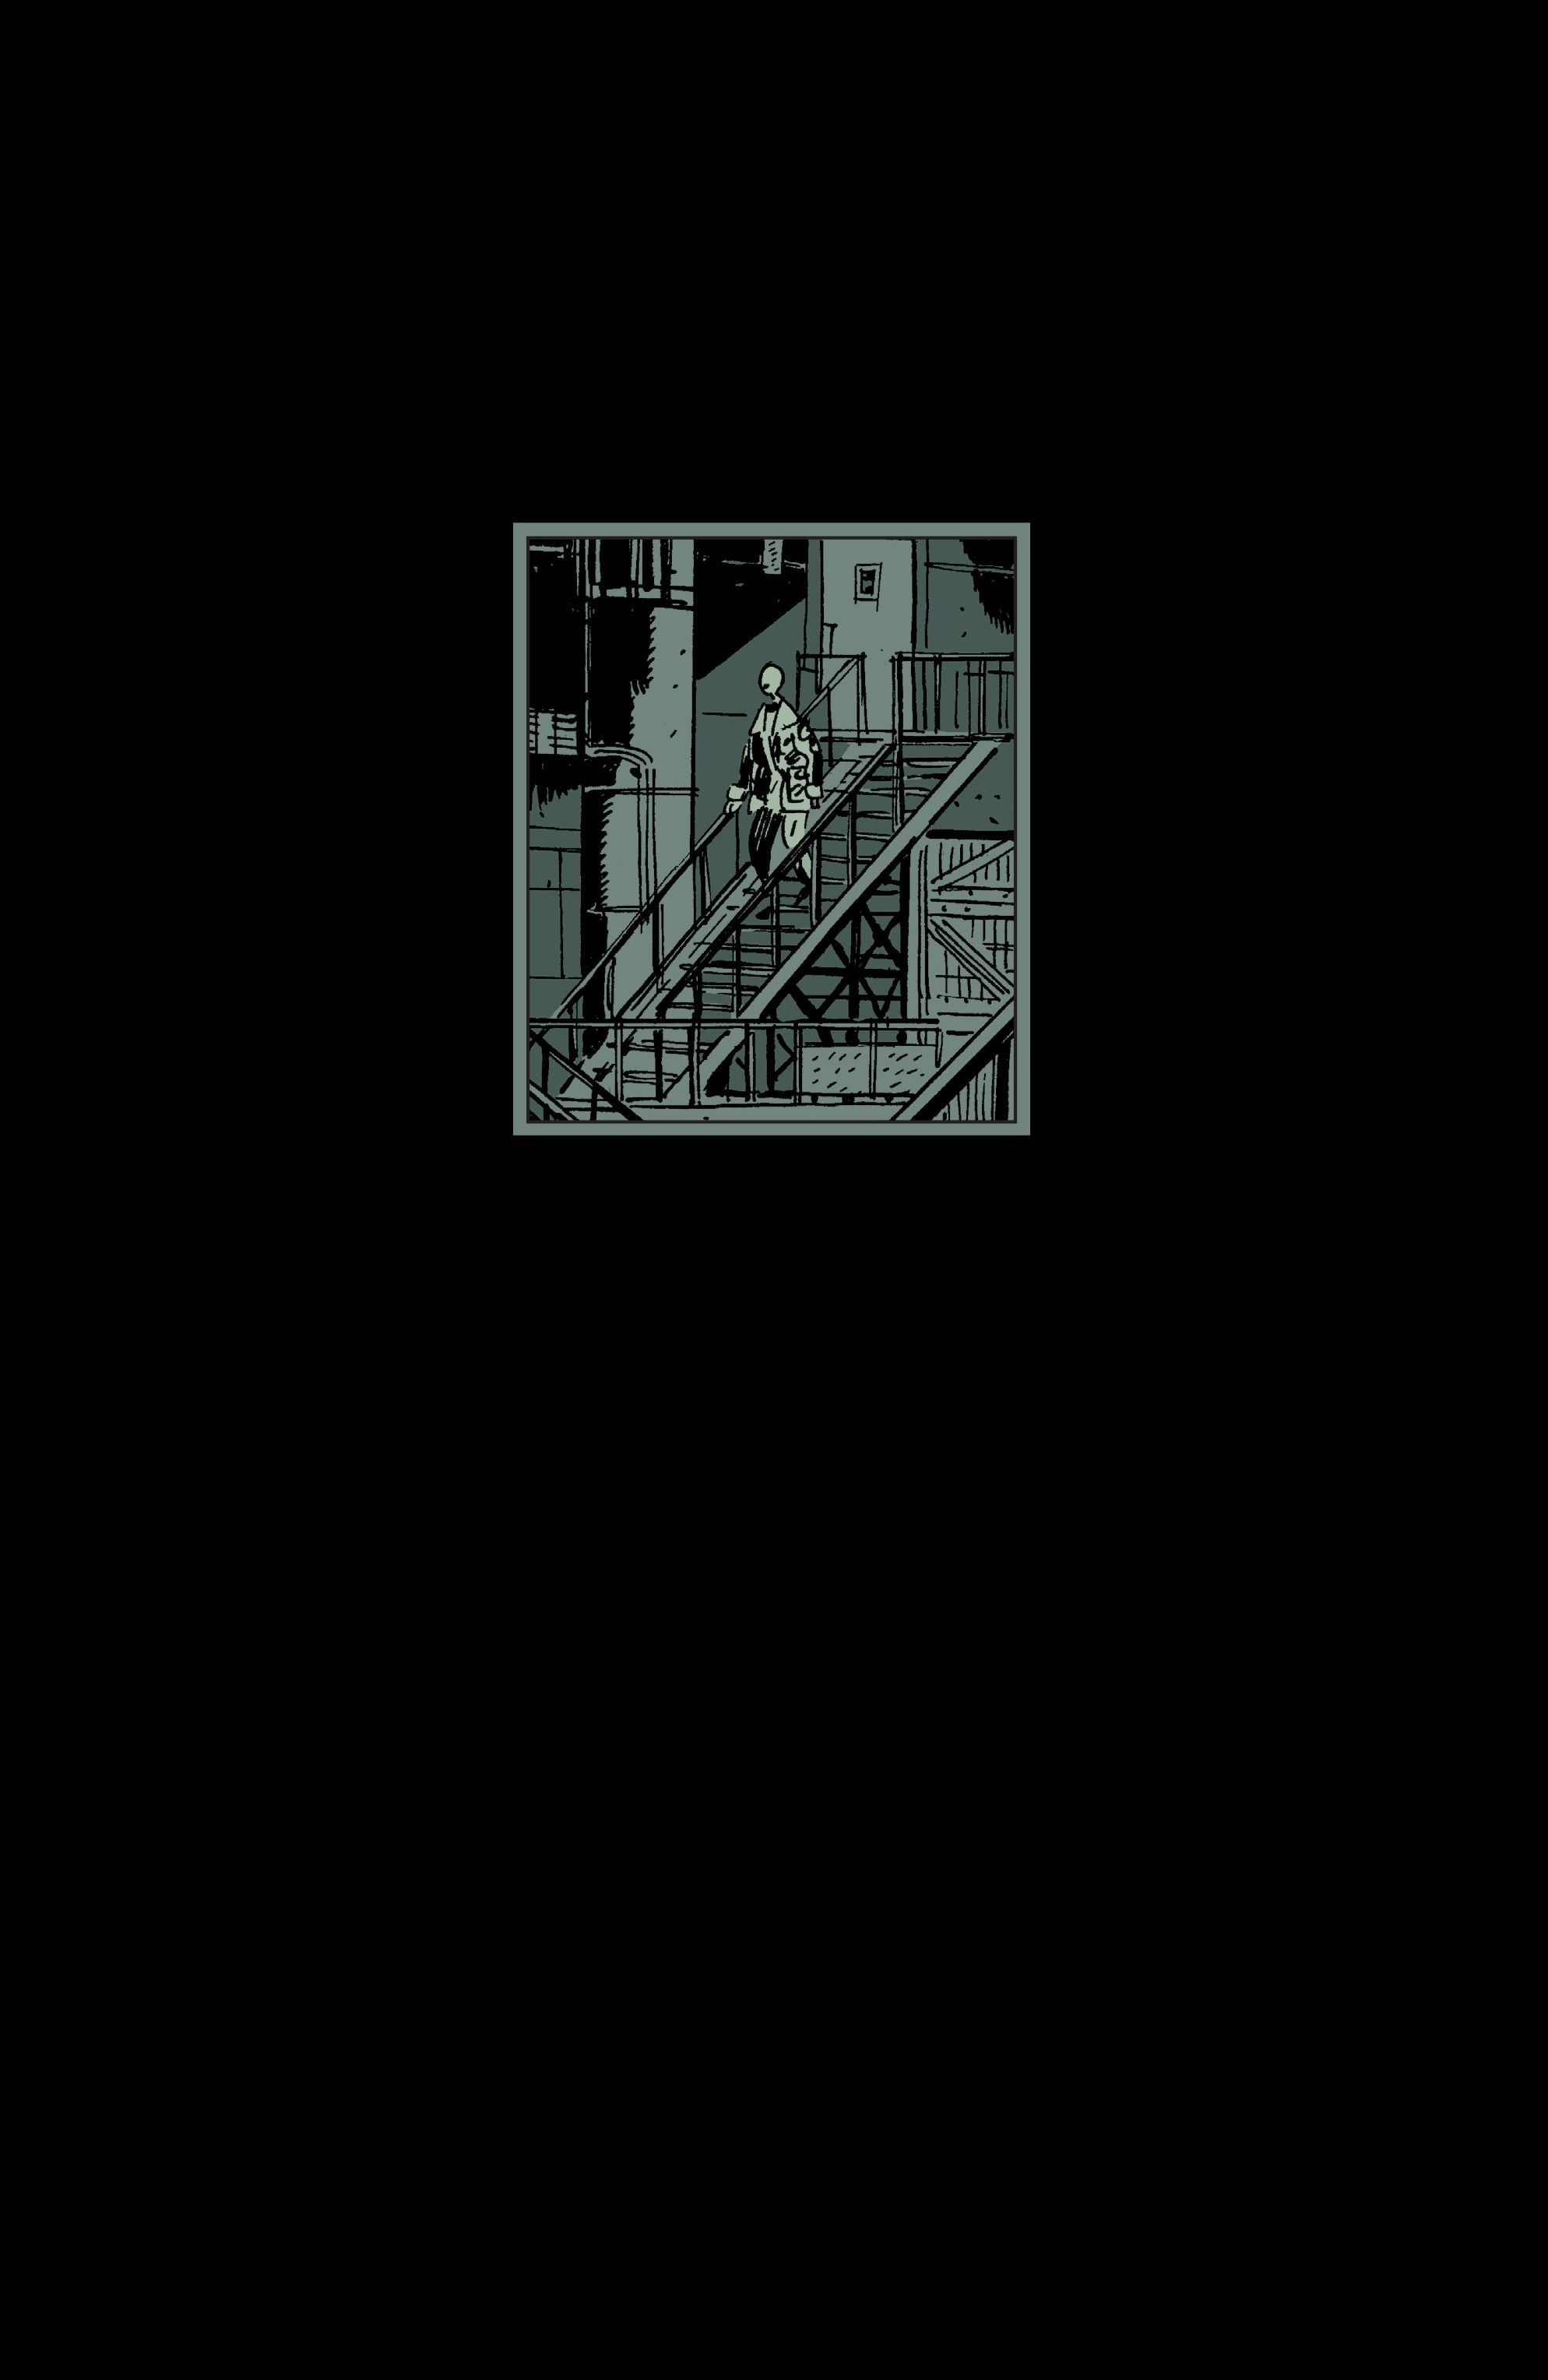 Read online B.P.R.D. (2003) comic -  Issue # TPB 10 - 7